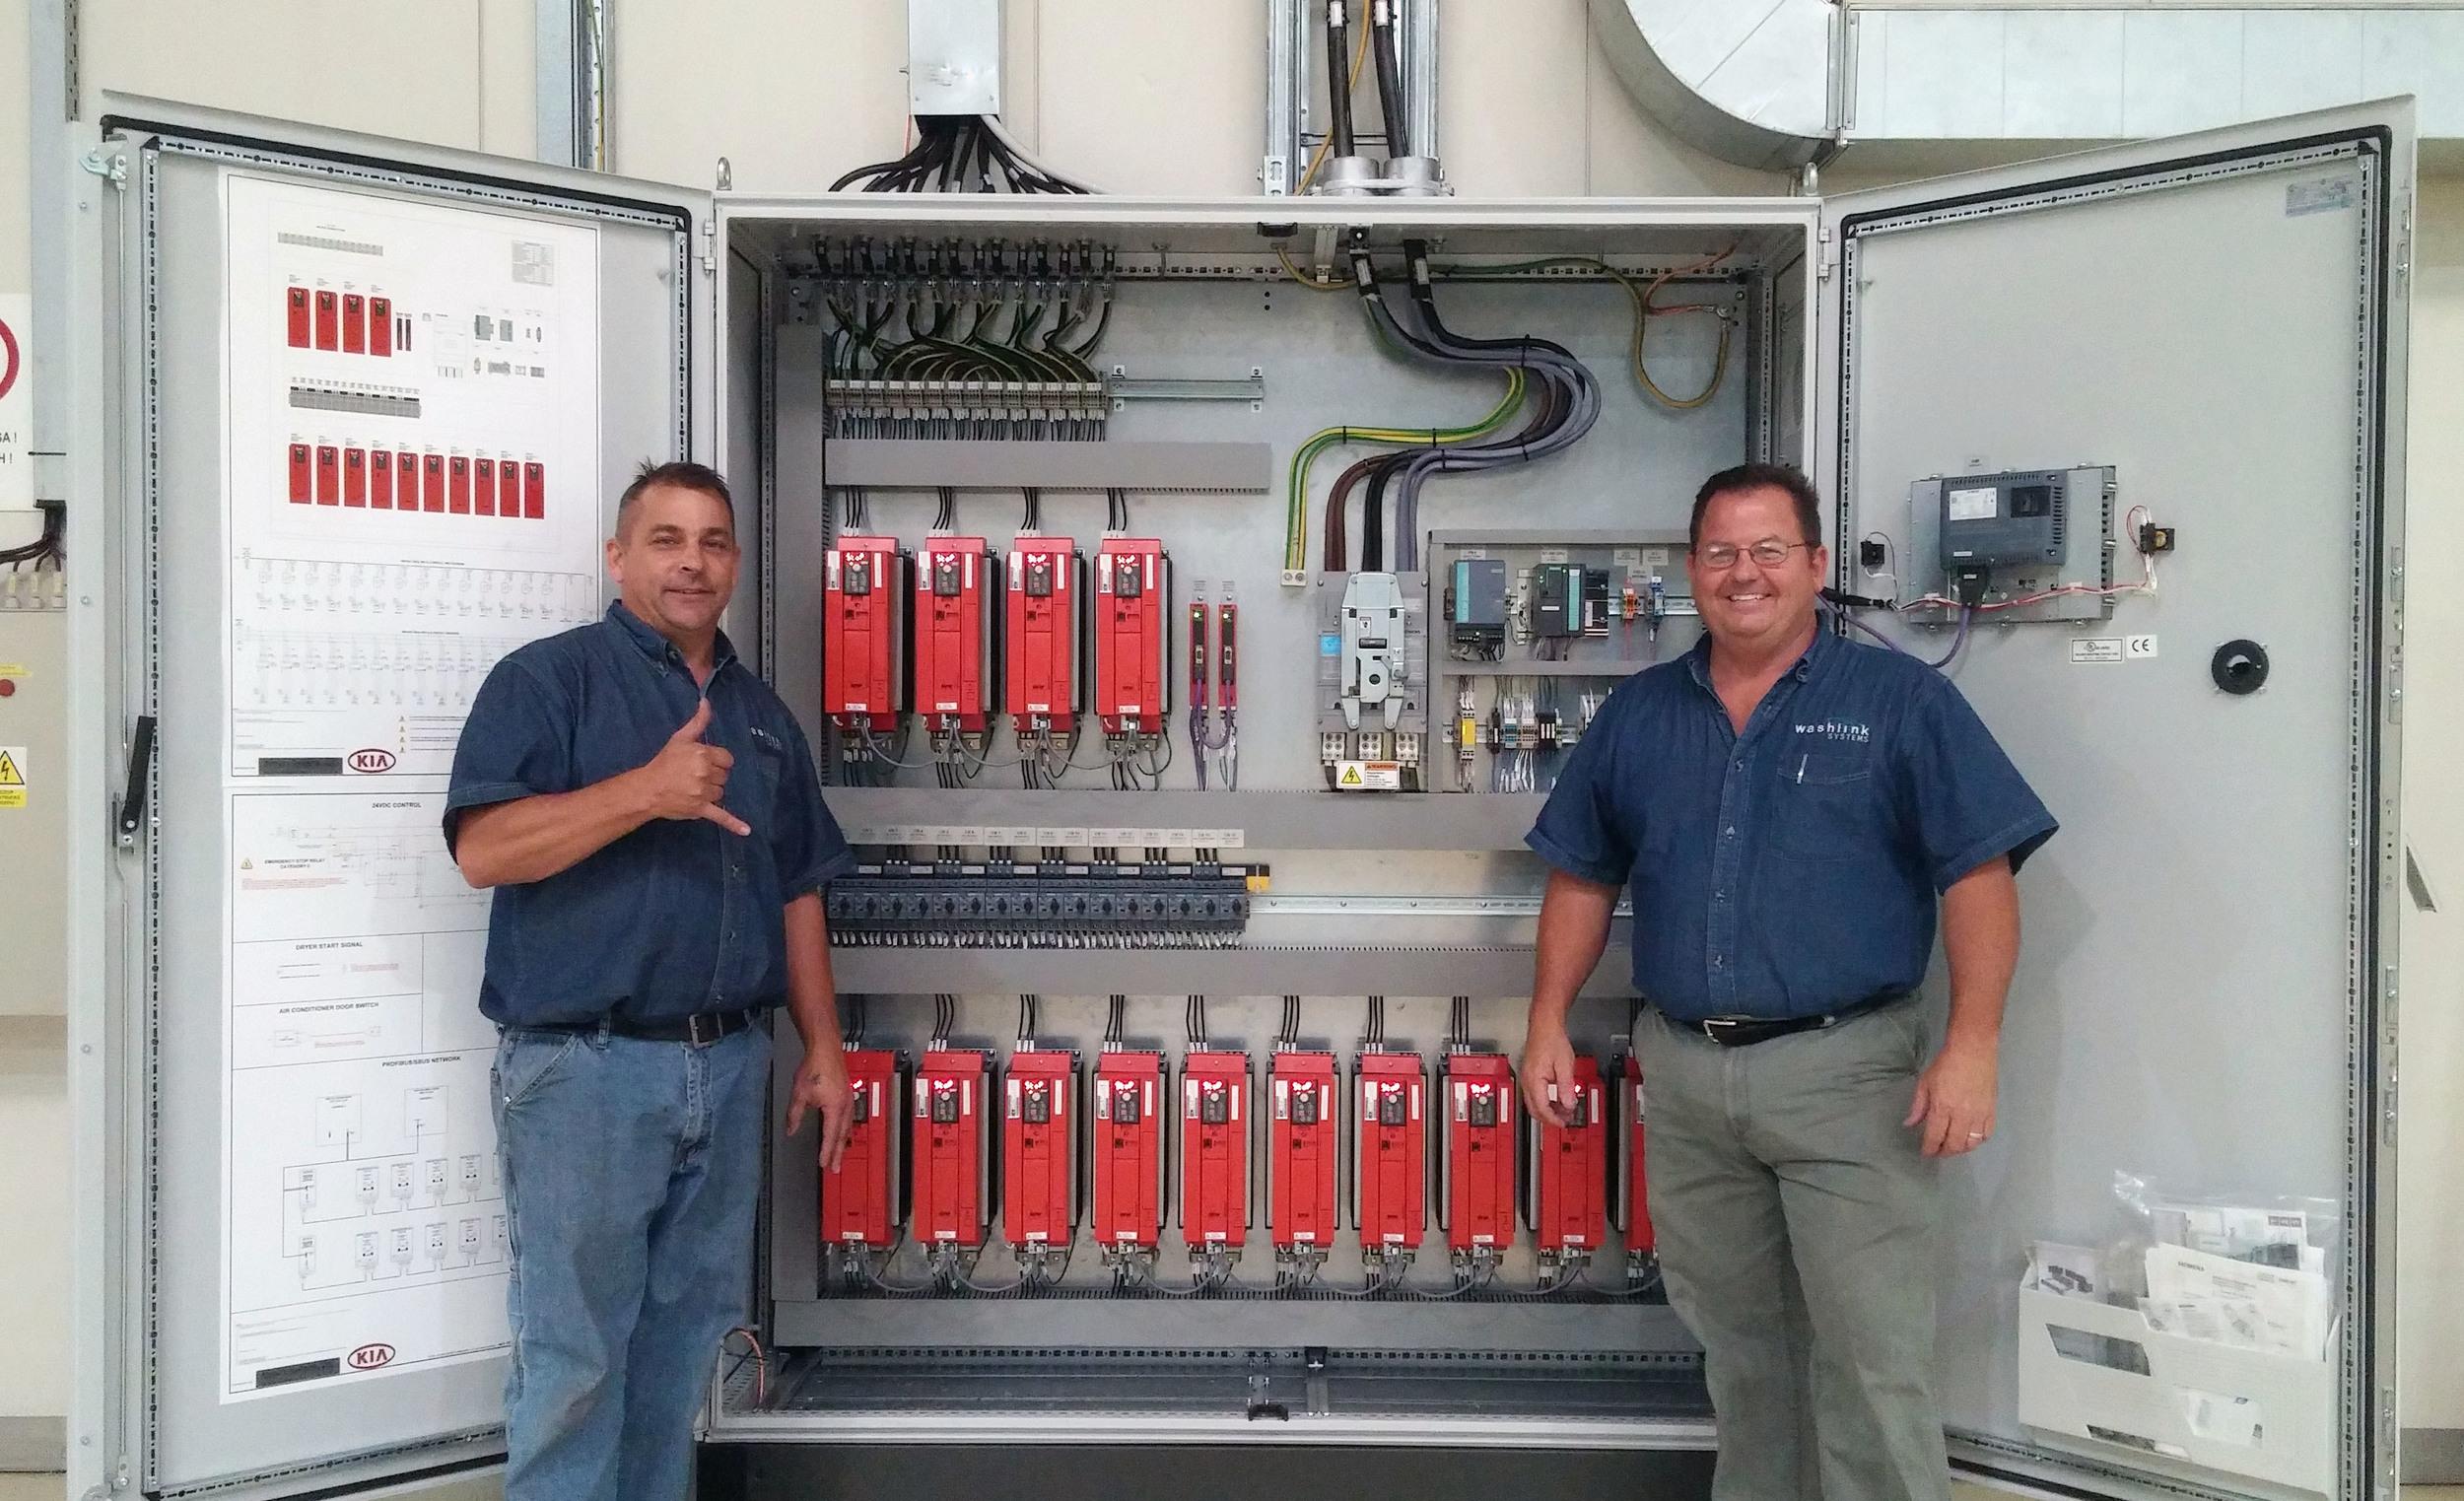 Washlink Systems team members Mike Jensen and Steve Homan